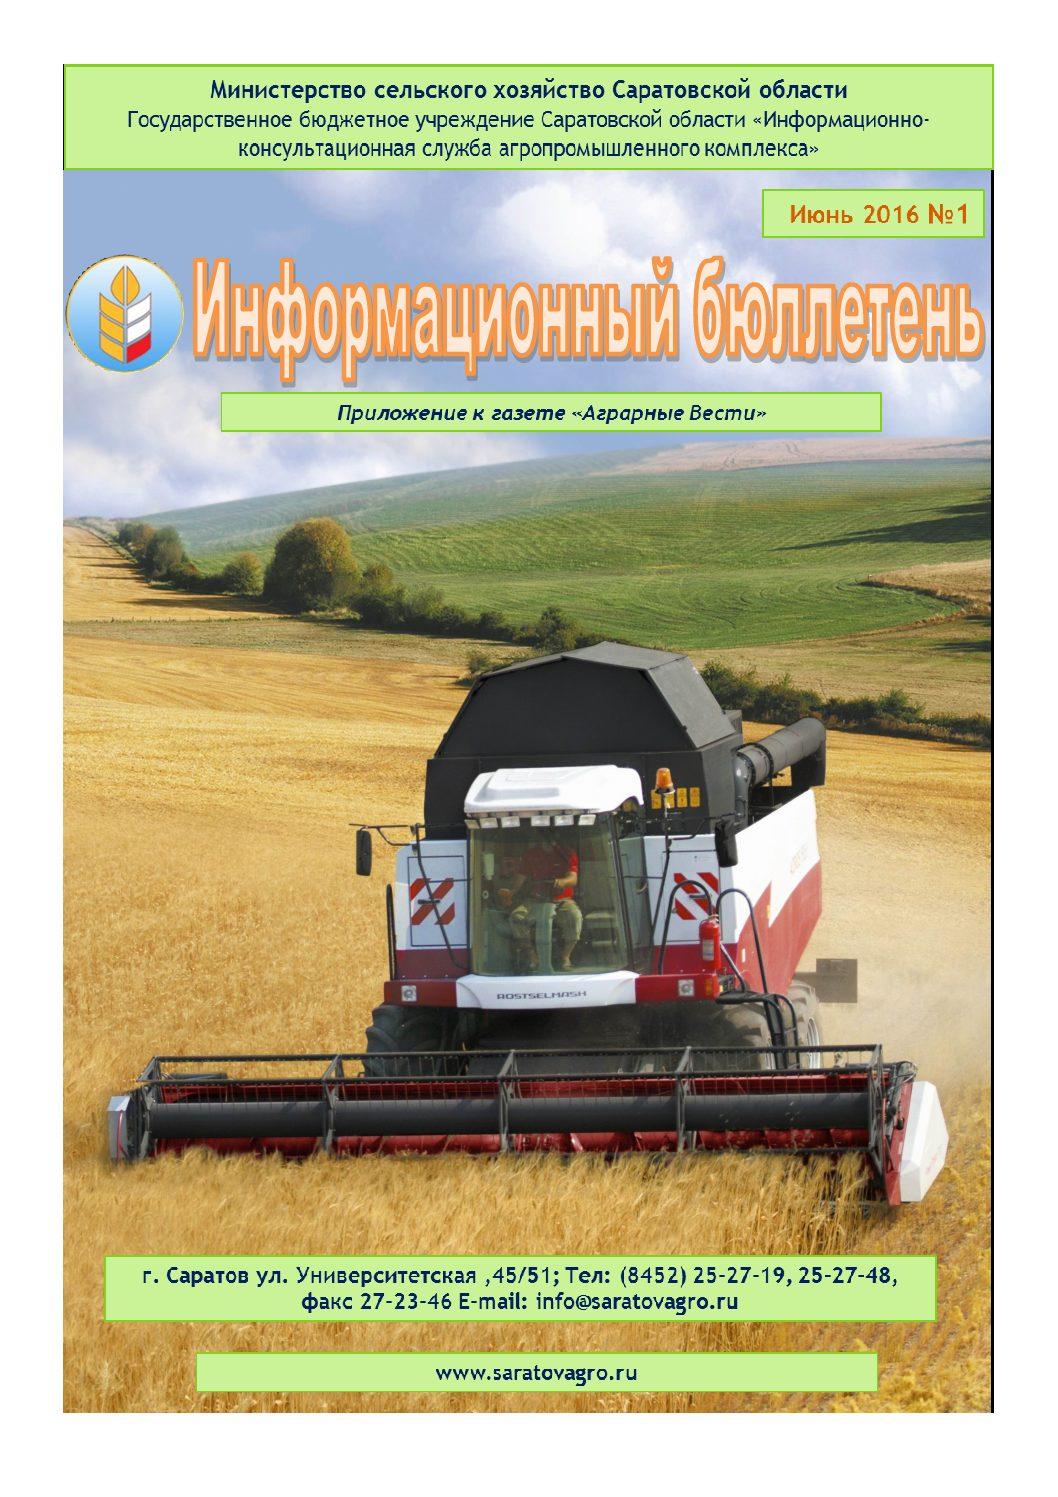 https://saratovagro.ru/wp-content/uploads/2020/08/№1-июнь-pdf.jpg